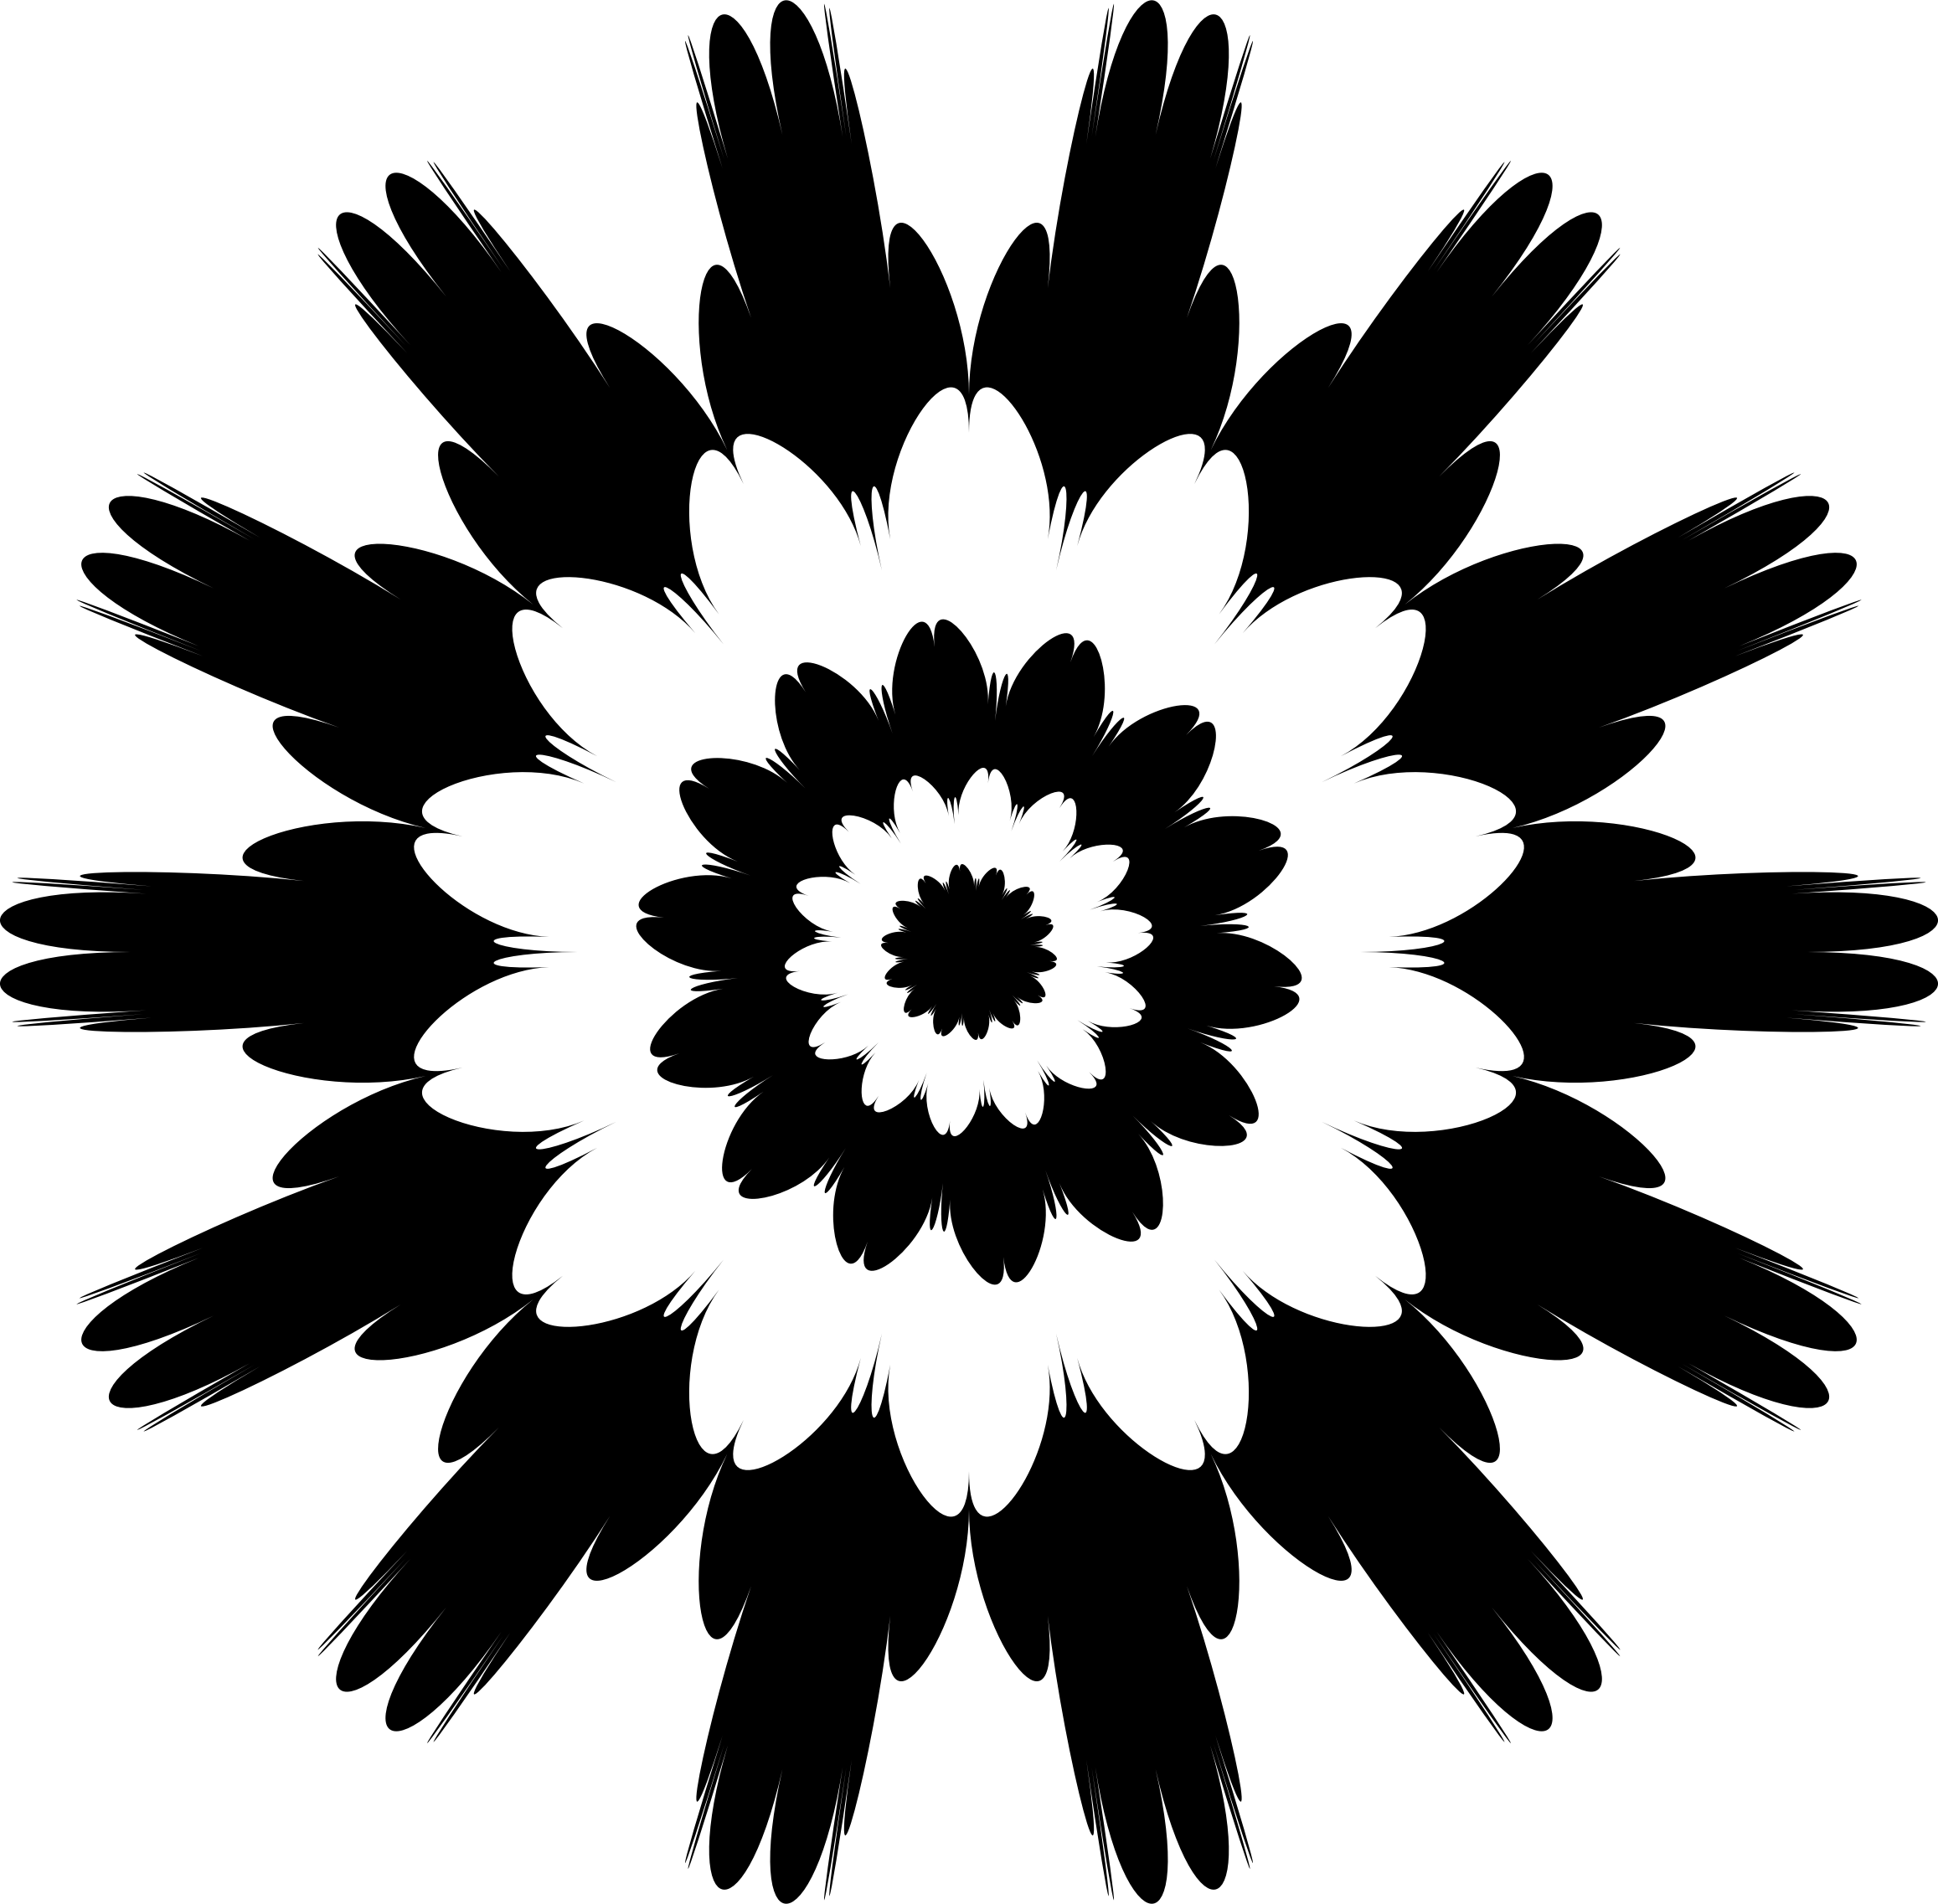 2314x2274 Clipart